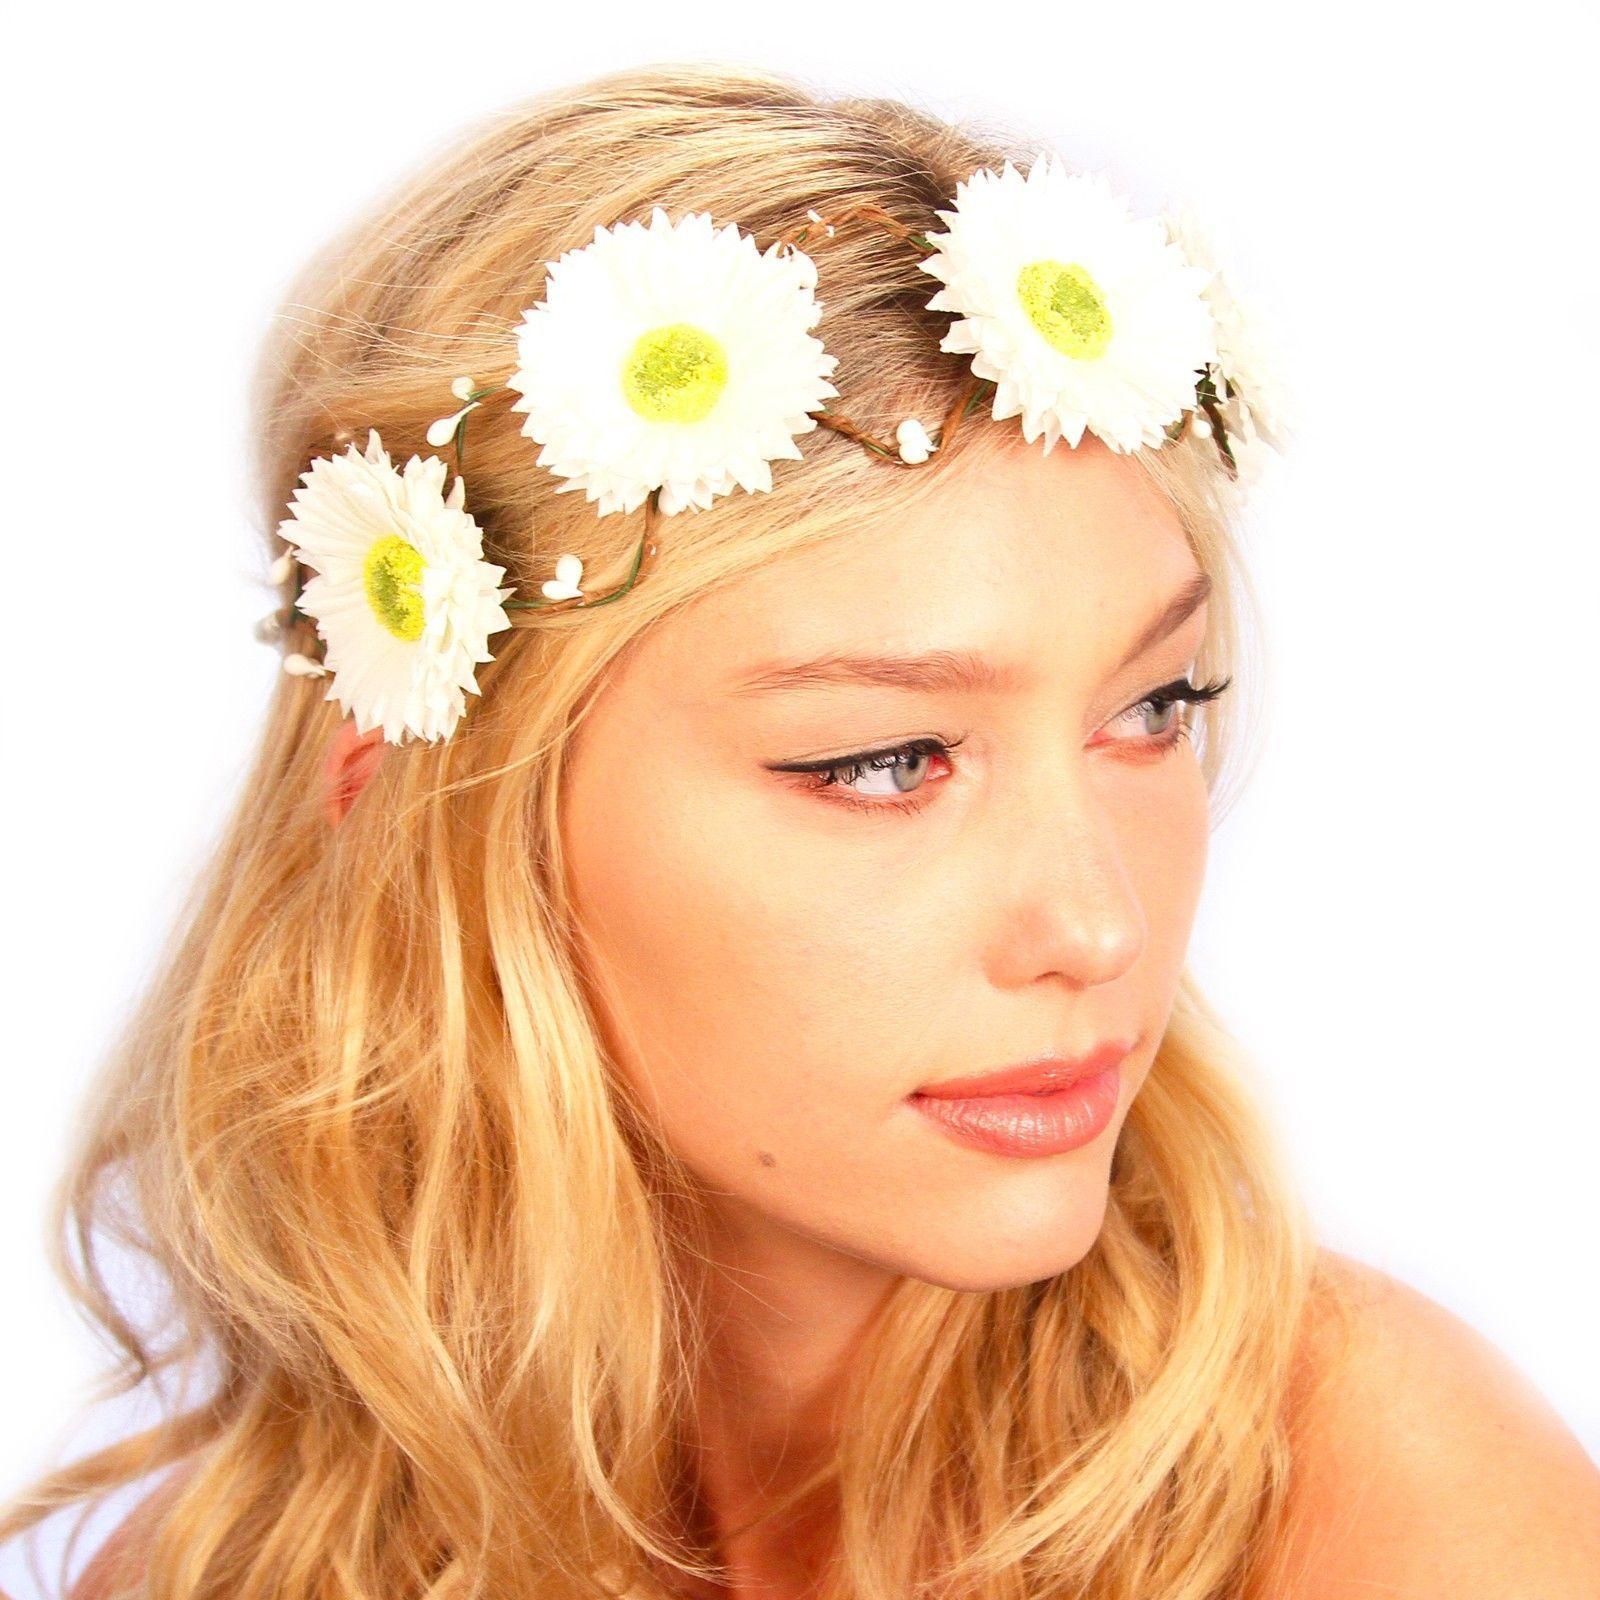 Kristin Perry Daisy Flower Headband Floral Head Wreath Products